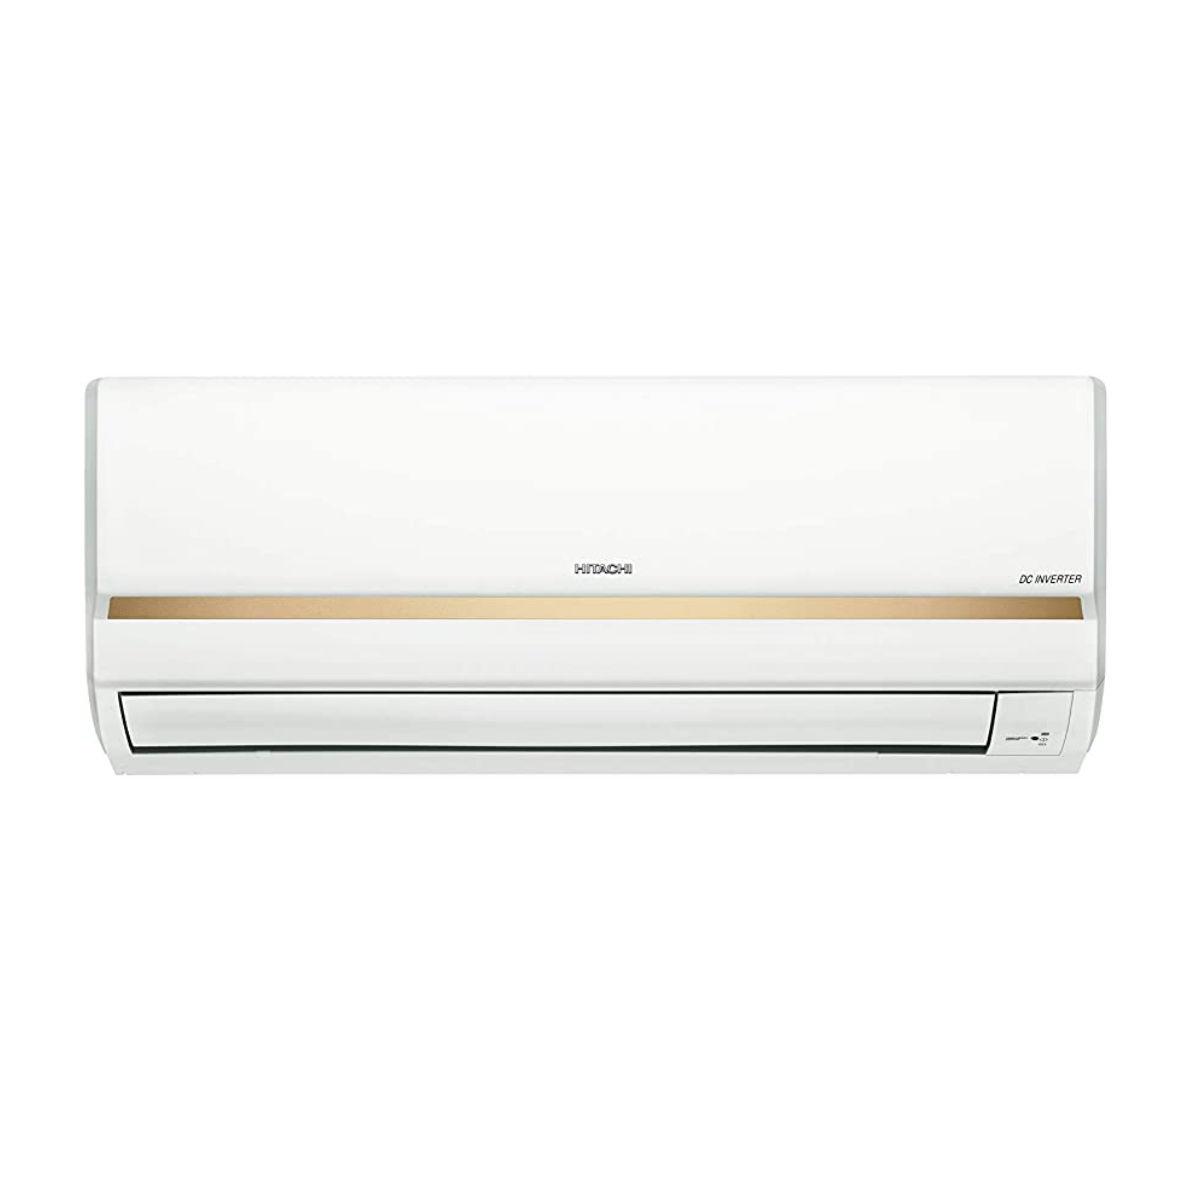 हिताची RMNG322HCEA 1.8 Ton 3 Star Inverter Split Air Conditioner